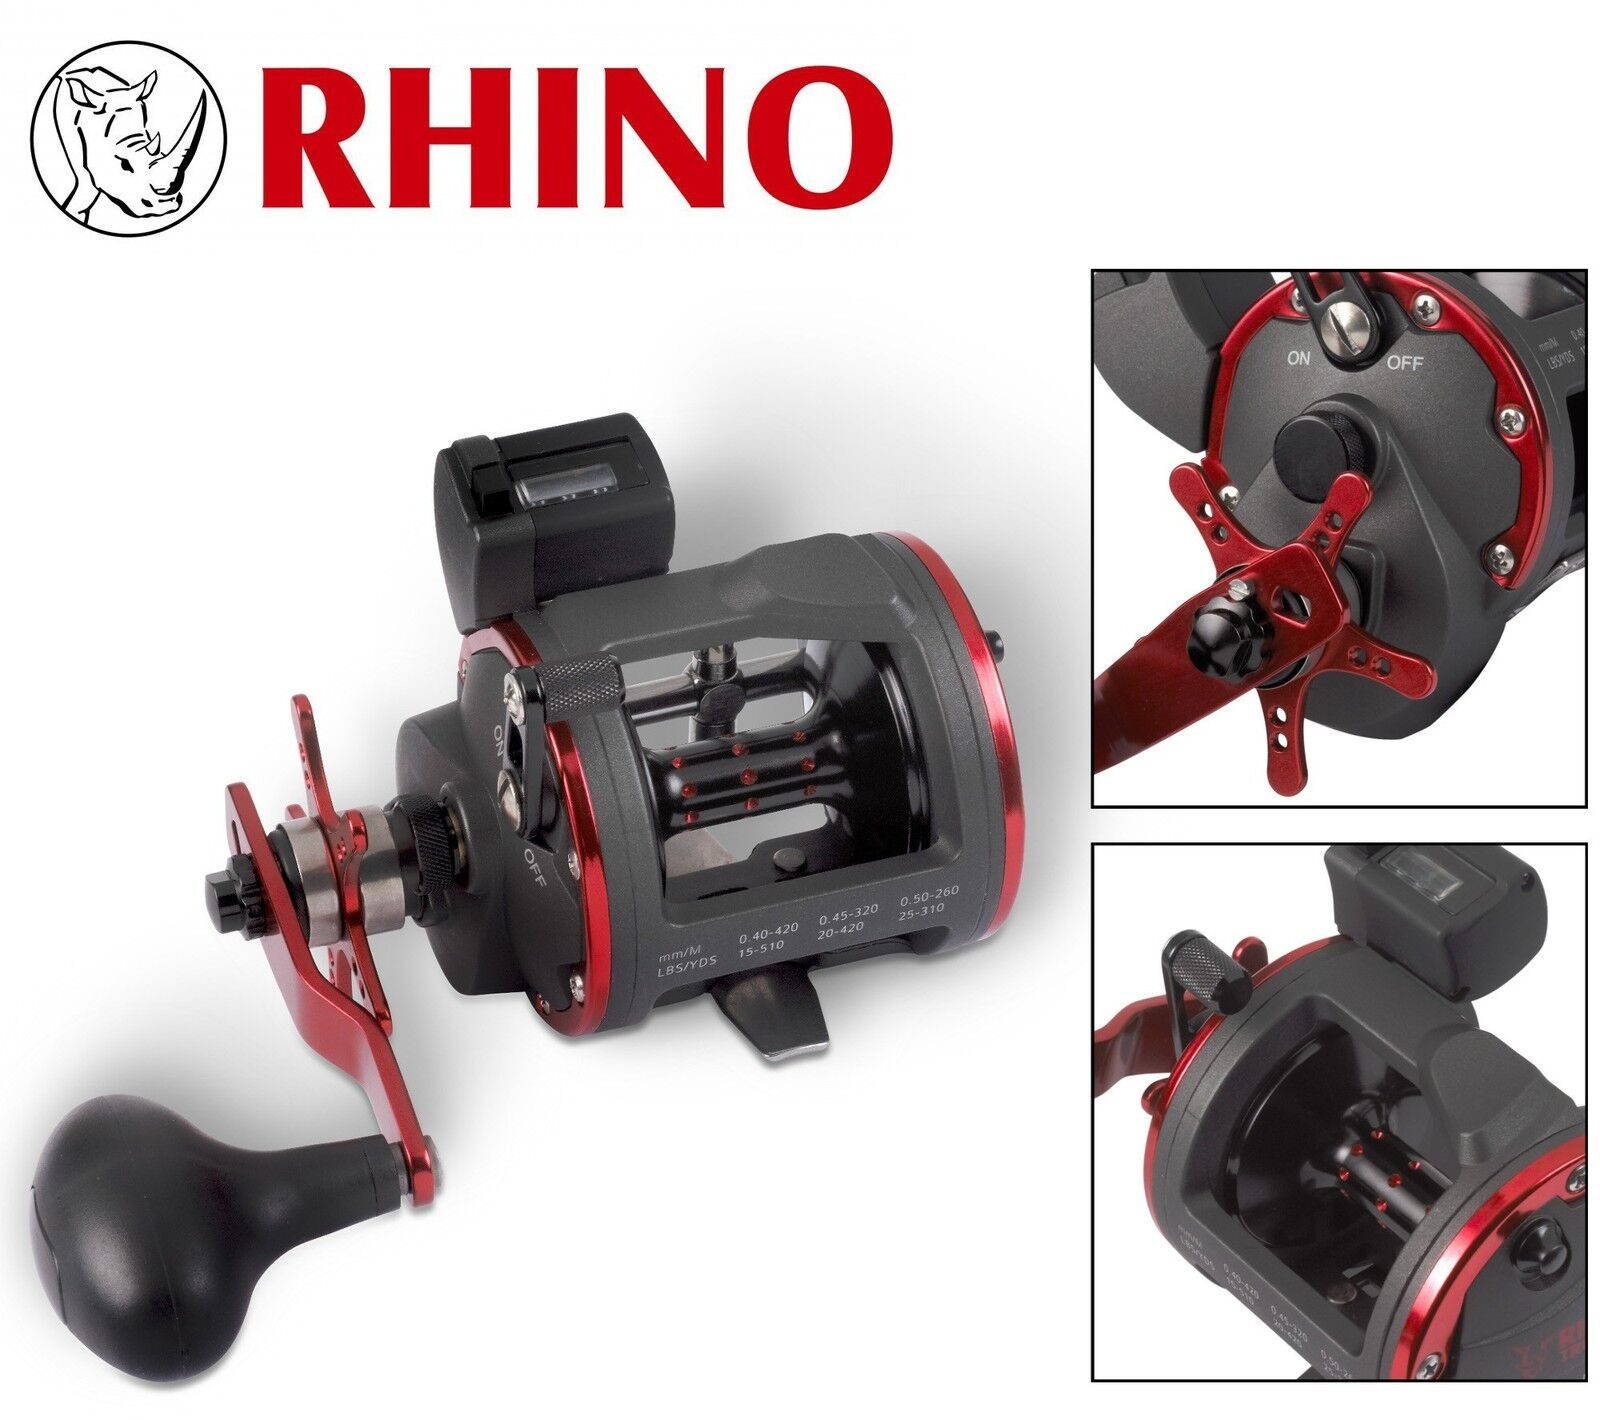 Rhino Trolling 430 LH Rolle Multirolle, Angelrolle zum Meeresangeln, Meeresrolle